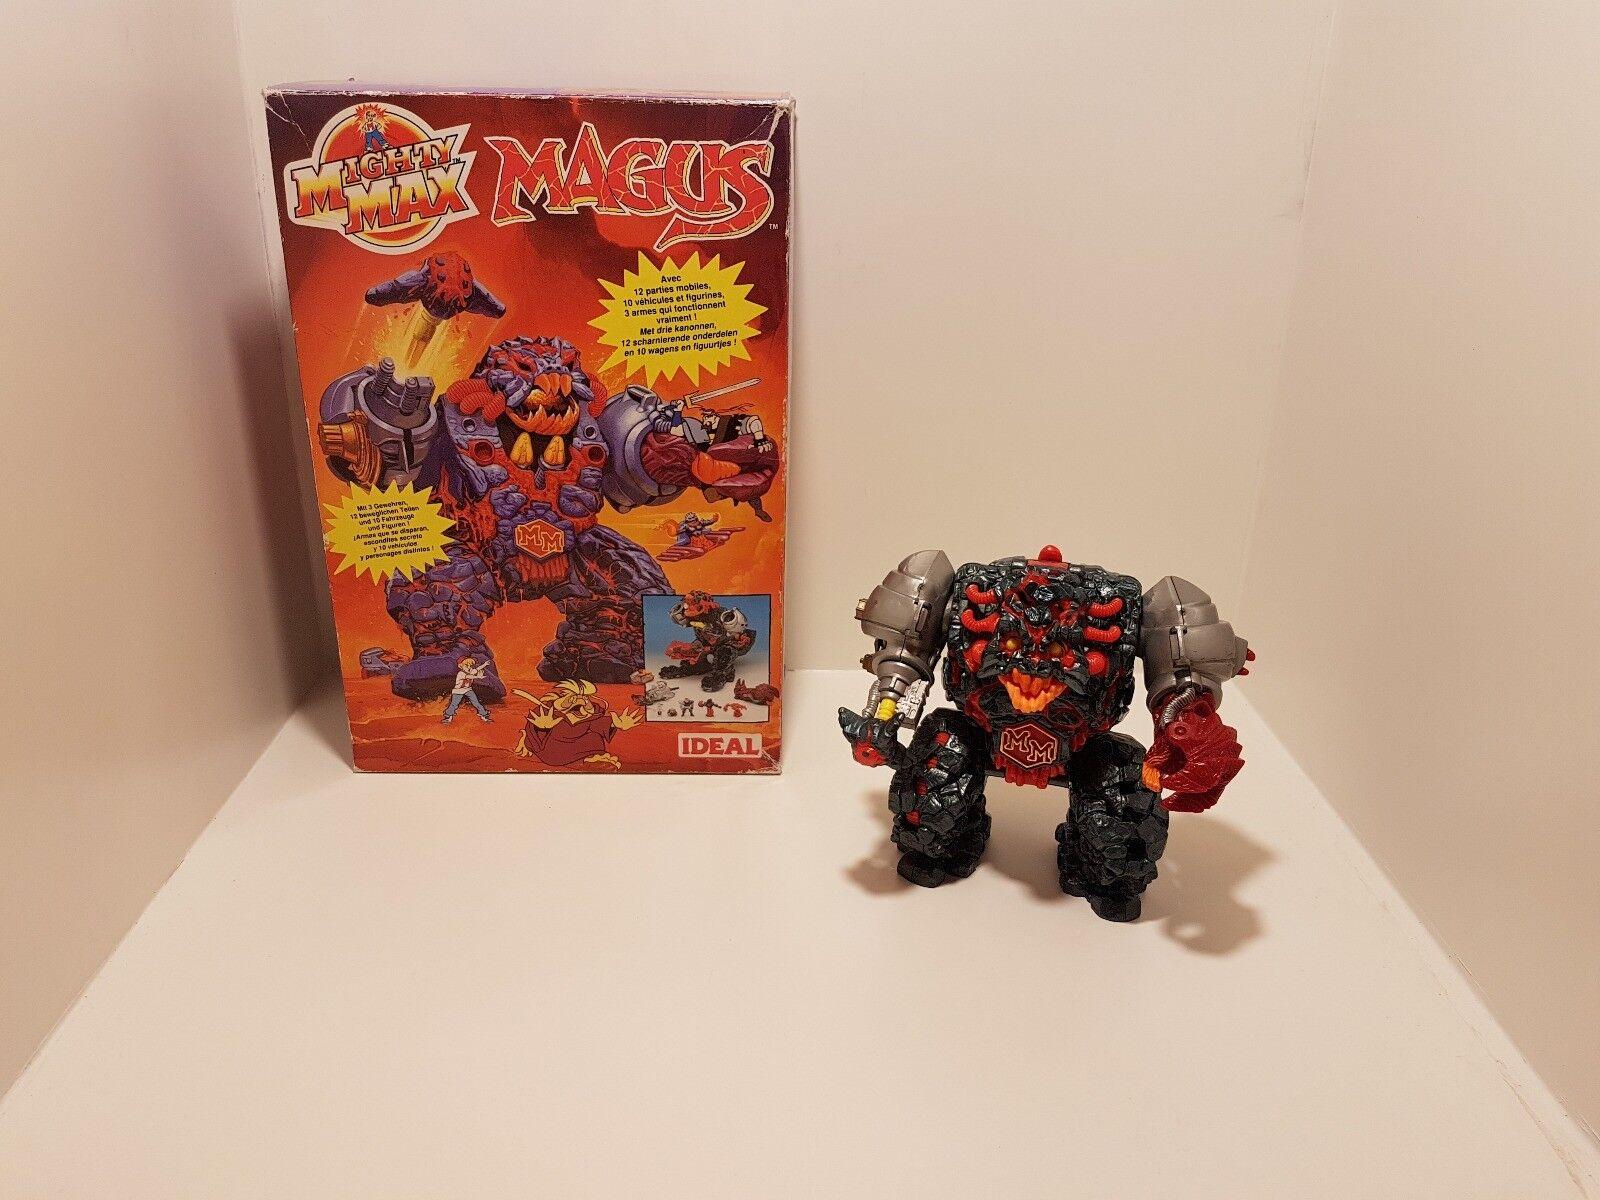 Mighty Max Blasts Magus Playset Vintage azione cifra blubird  1991 MIB 99%  basso prezzo del 40%